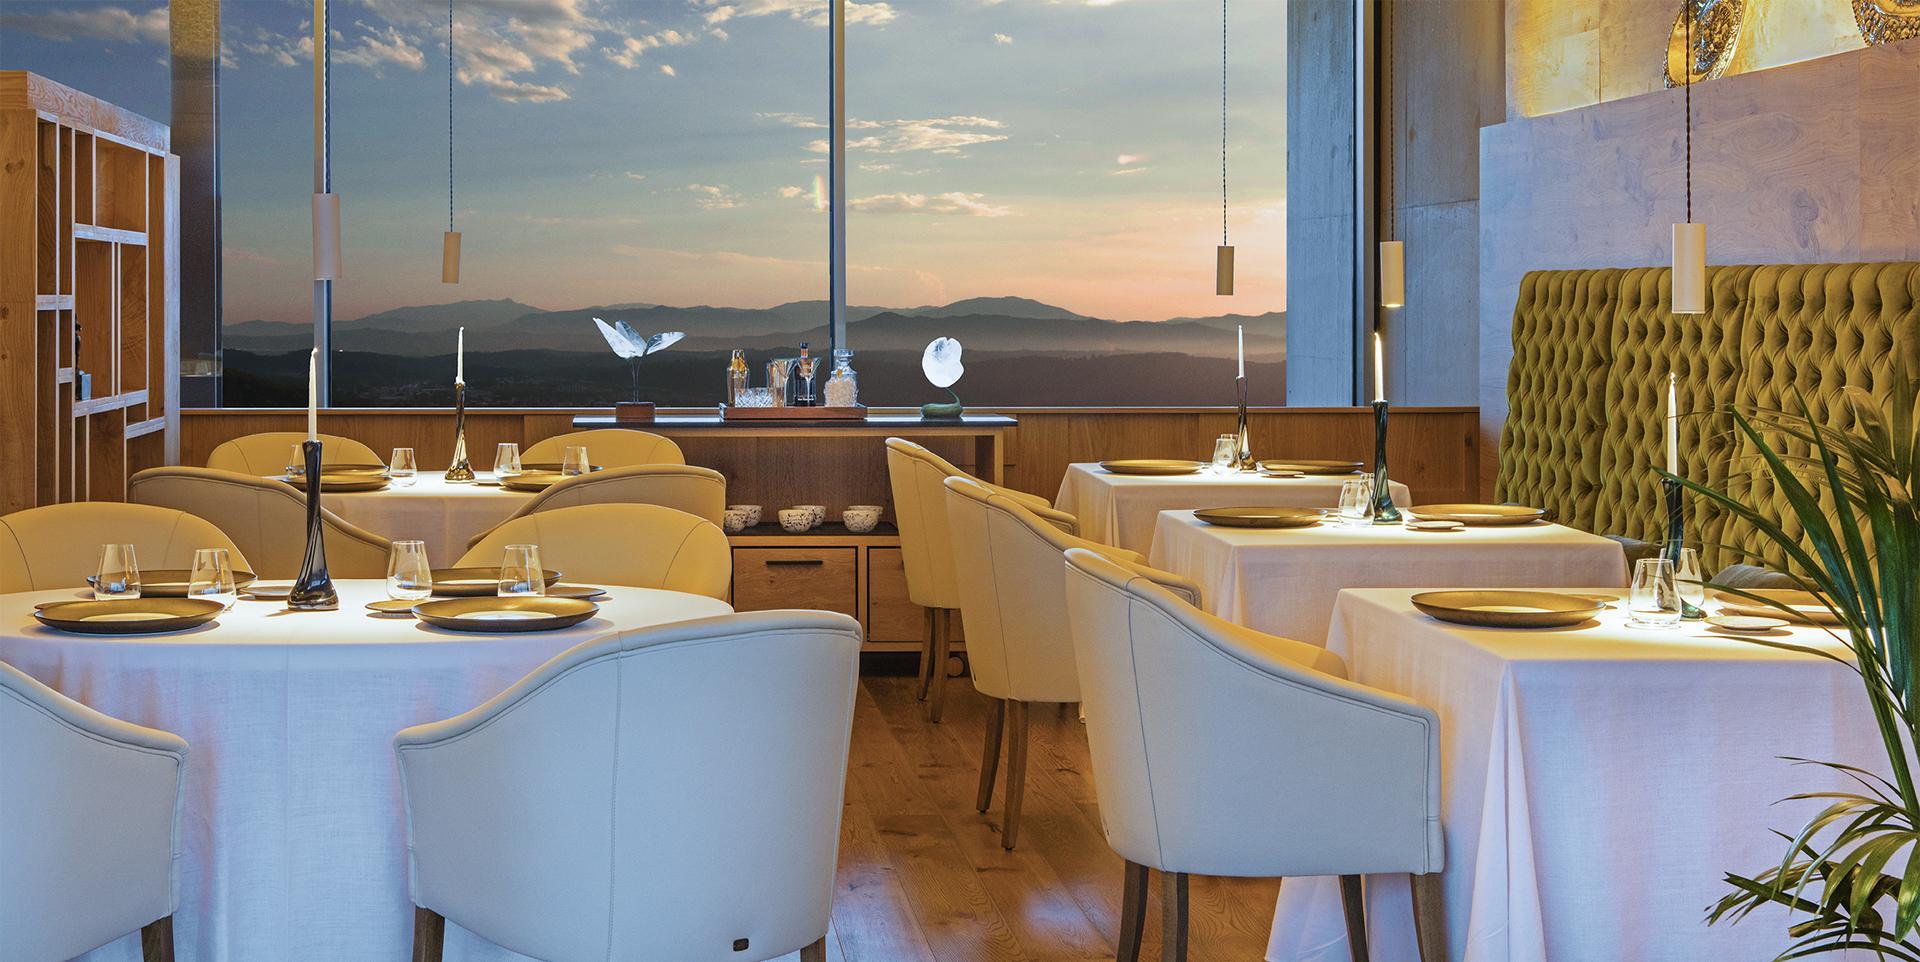 Restaurante_Atempo_La fortalesa5